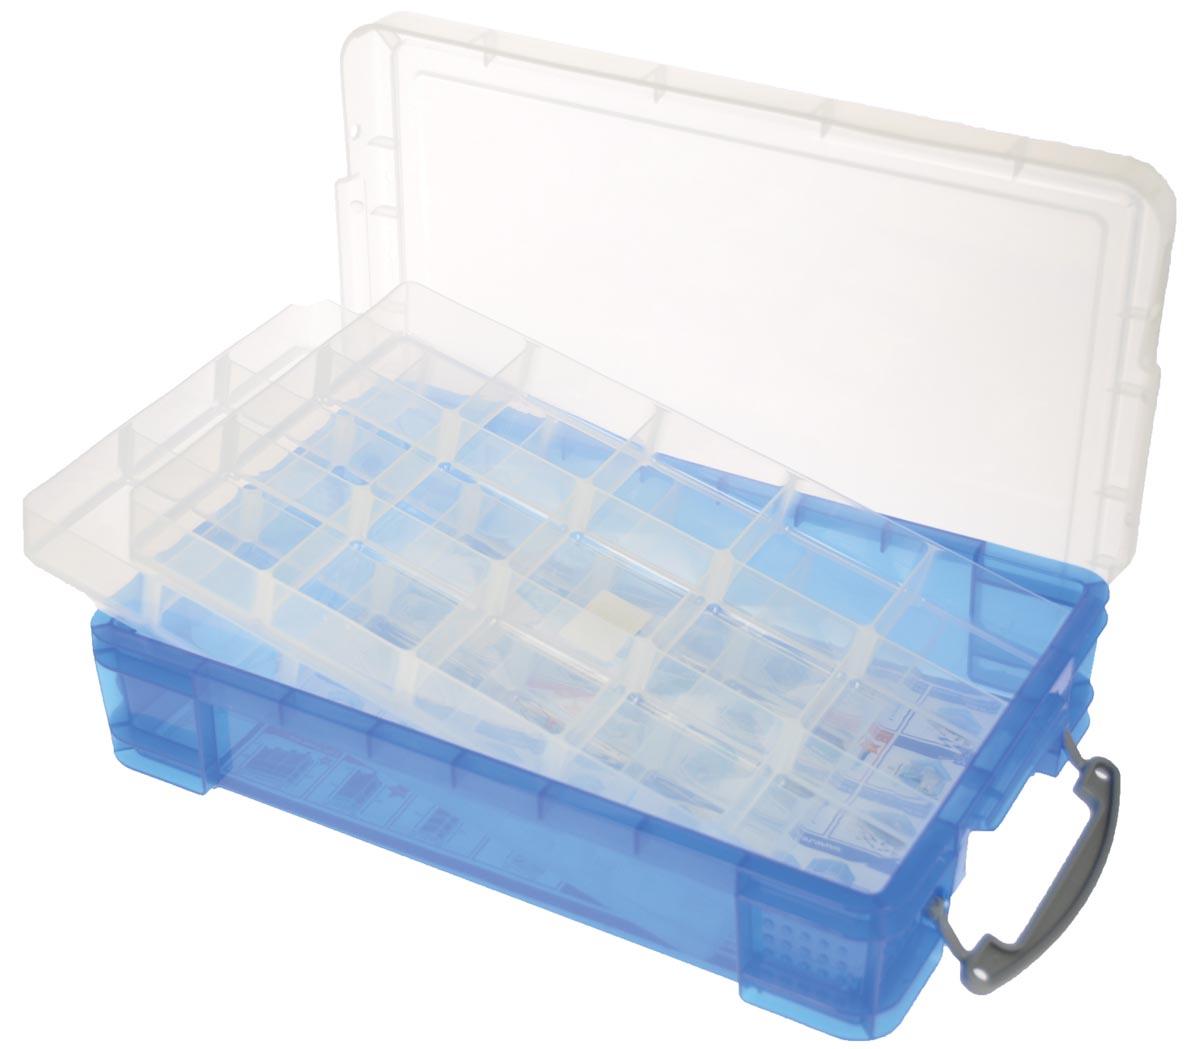 Really Useful Box opbergdoos 4 liter met 2 dividers, transparant blauw